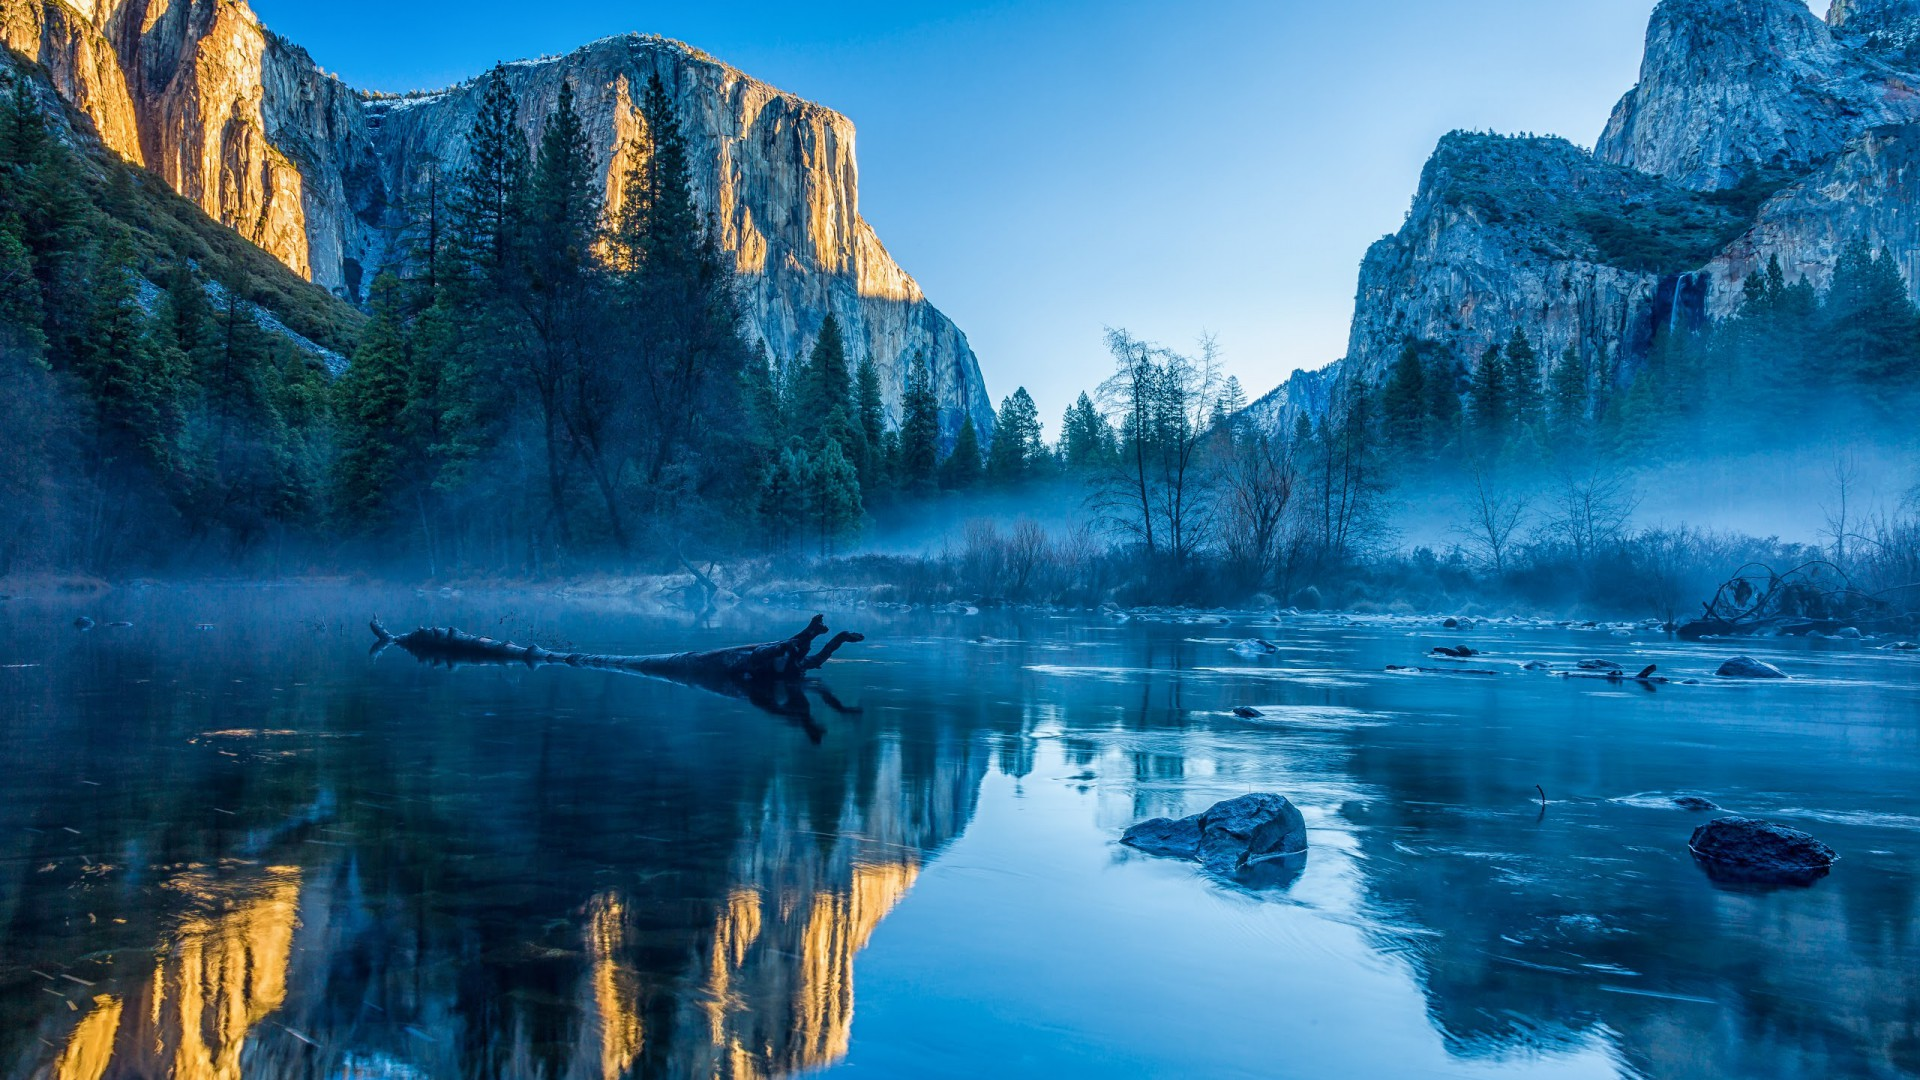 Wallpaper Yosemite El Capitan Hd 4k Wallpaper Winter